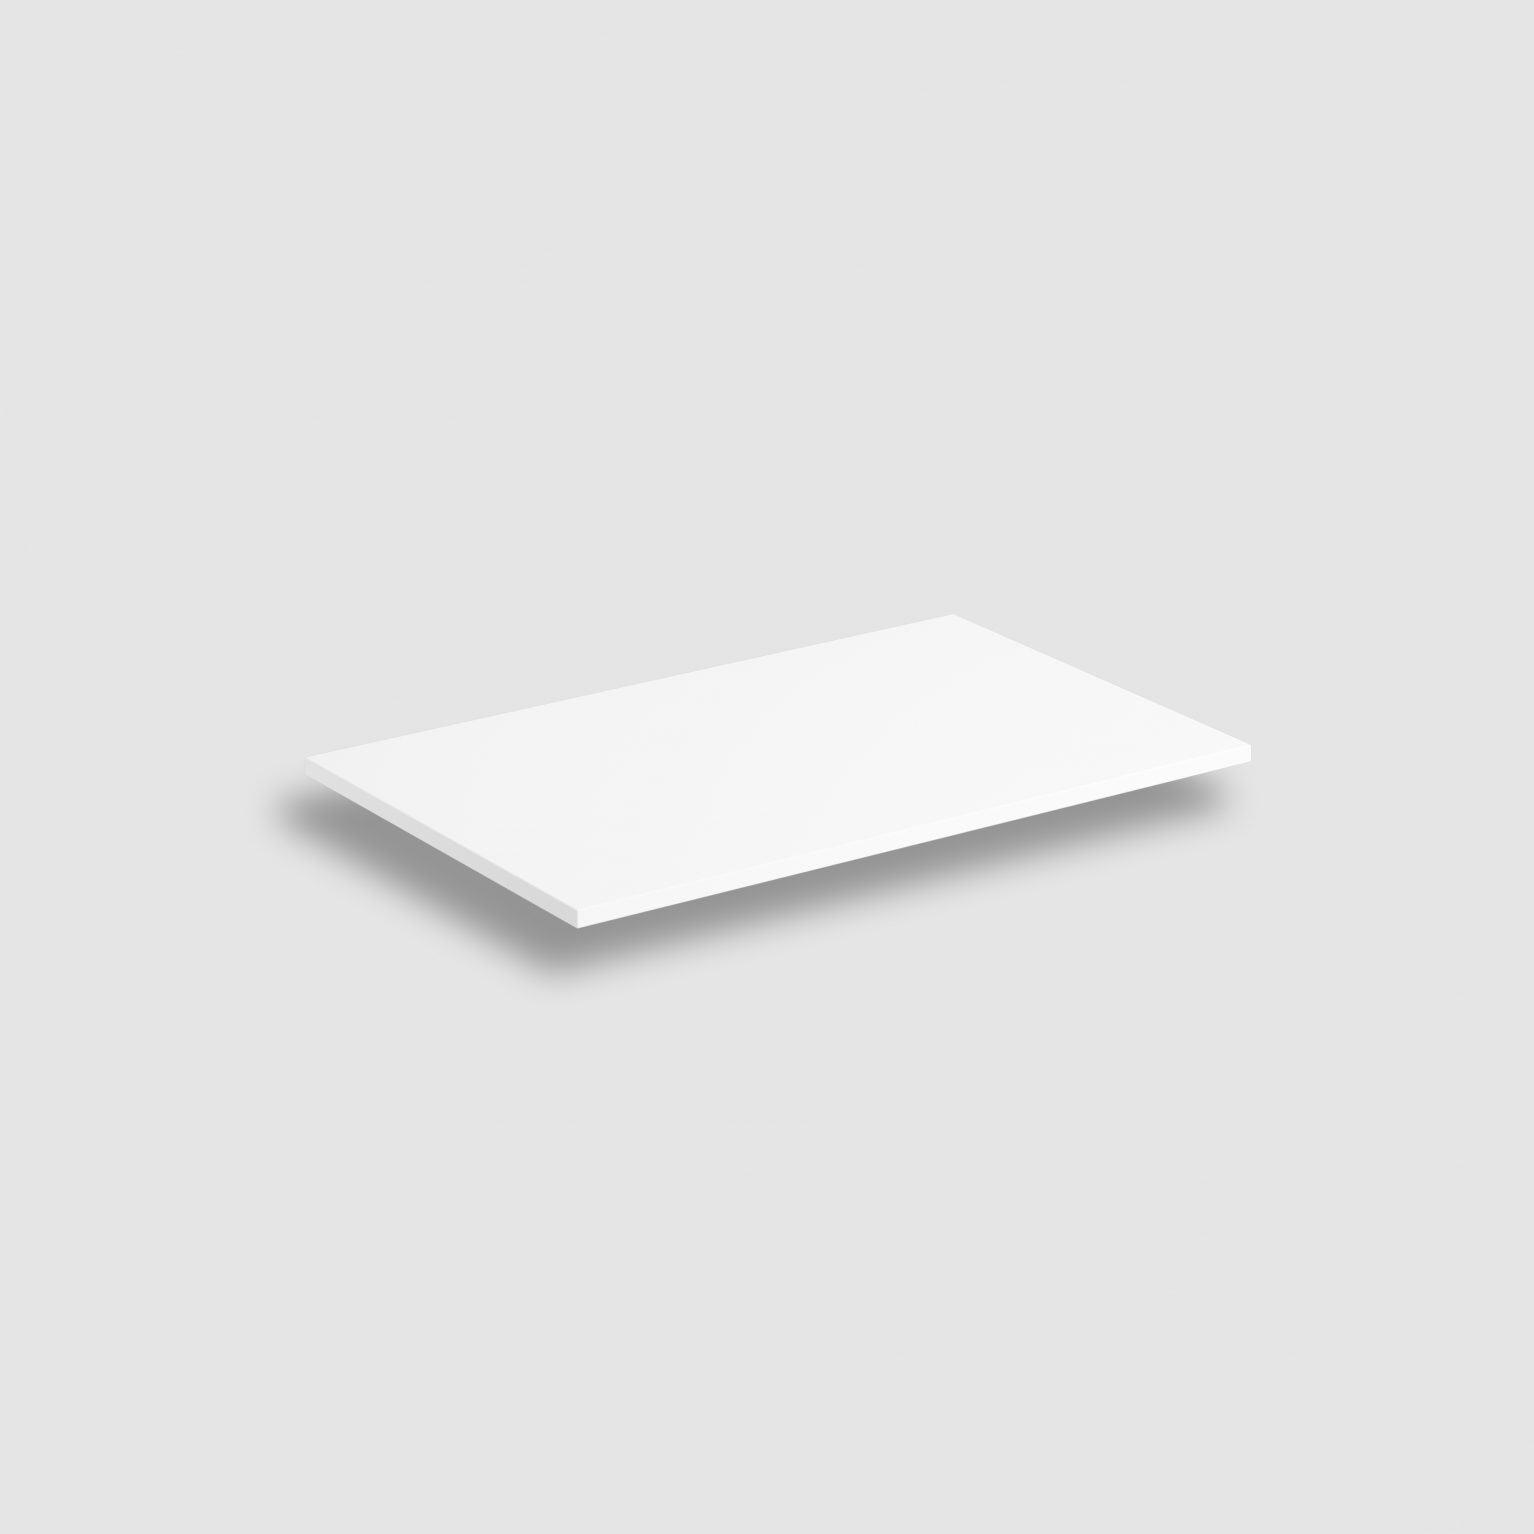 (New) Wash Me Frame inleg planchet 70 cm, mat wit aluite)